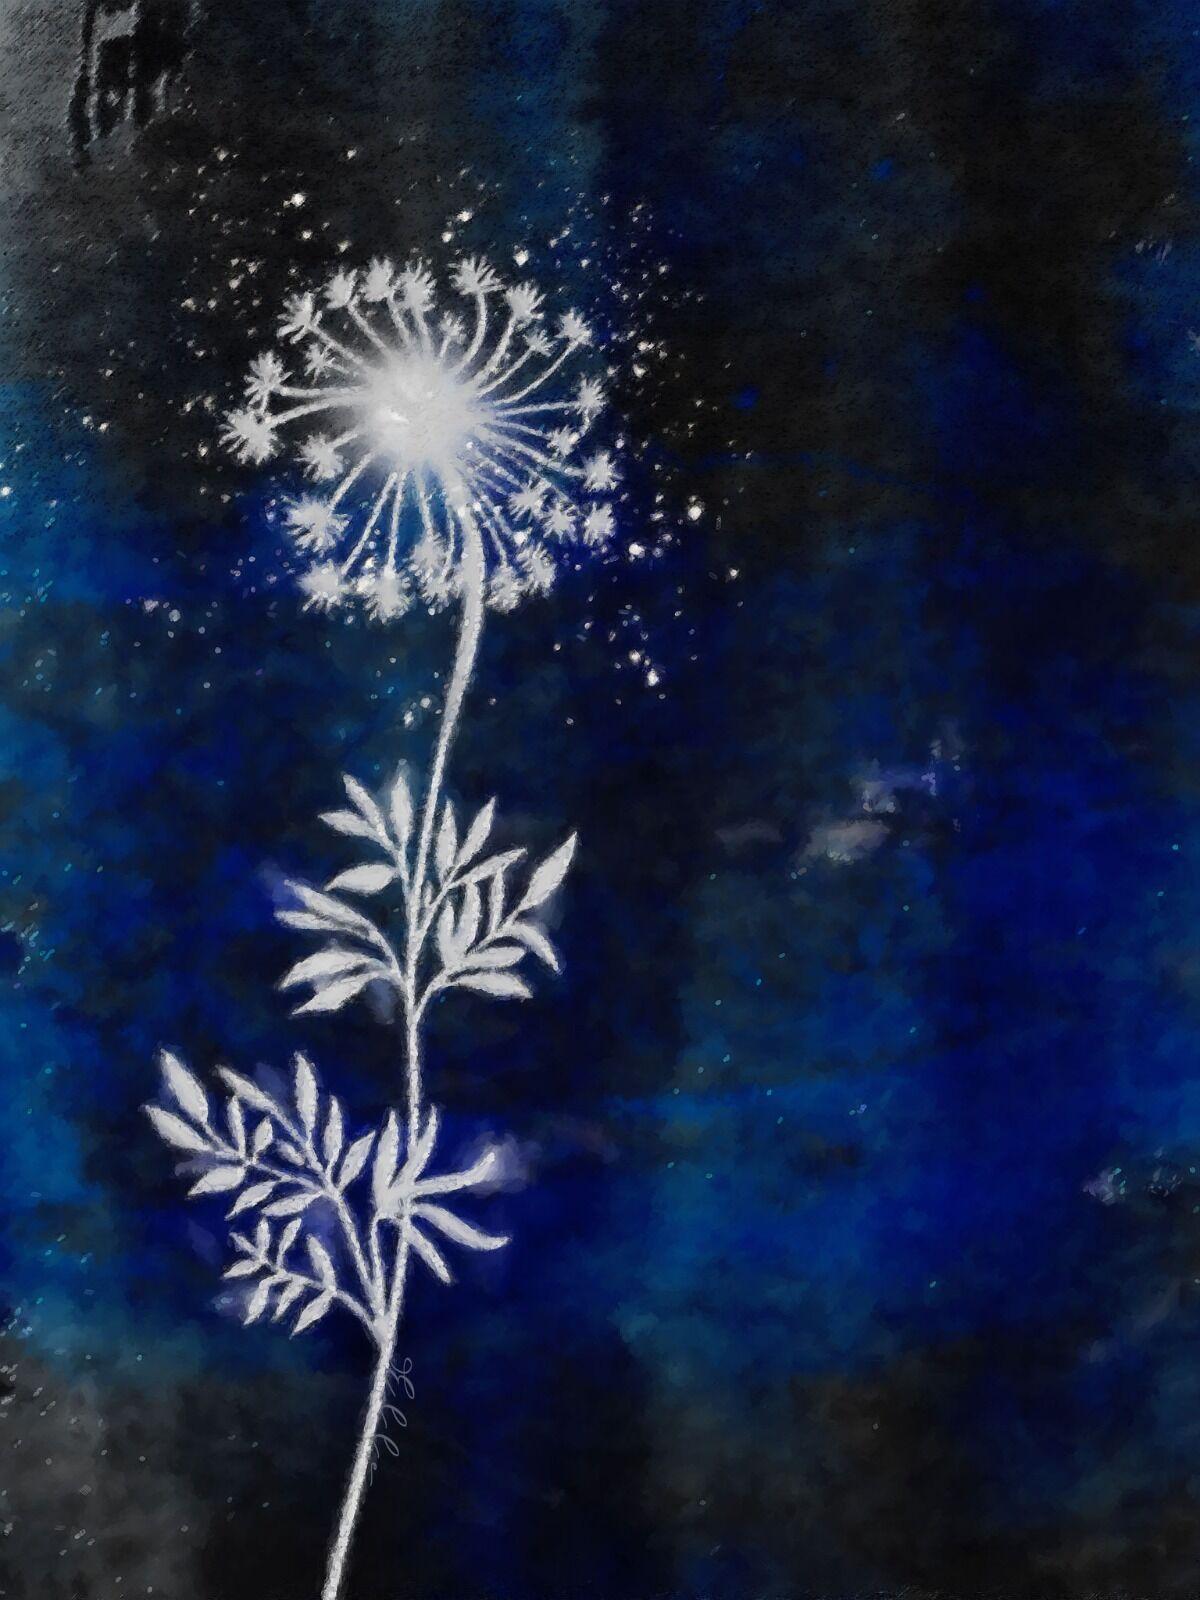 Plants by Moonlight